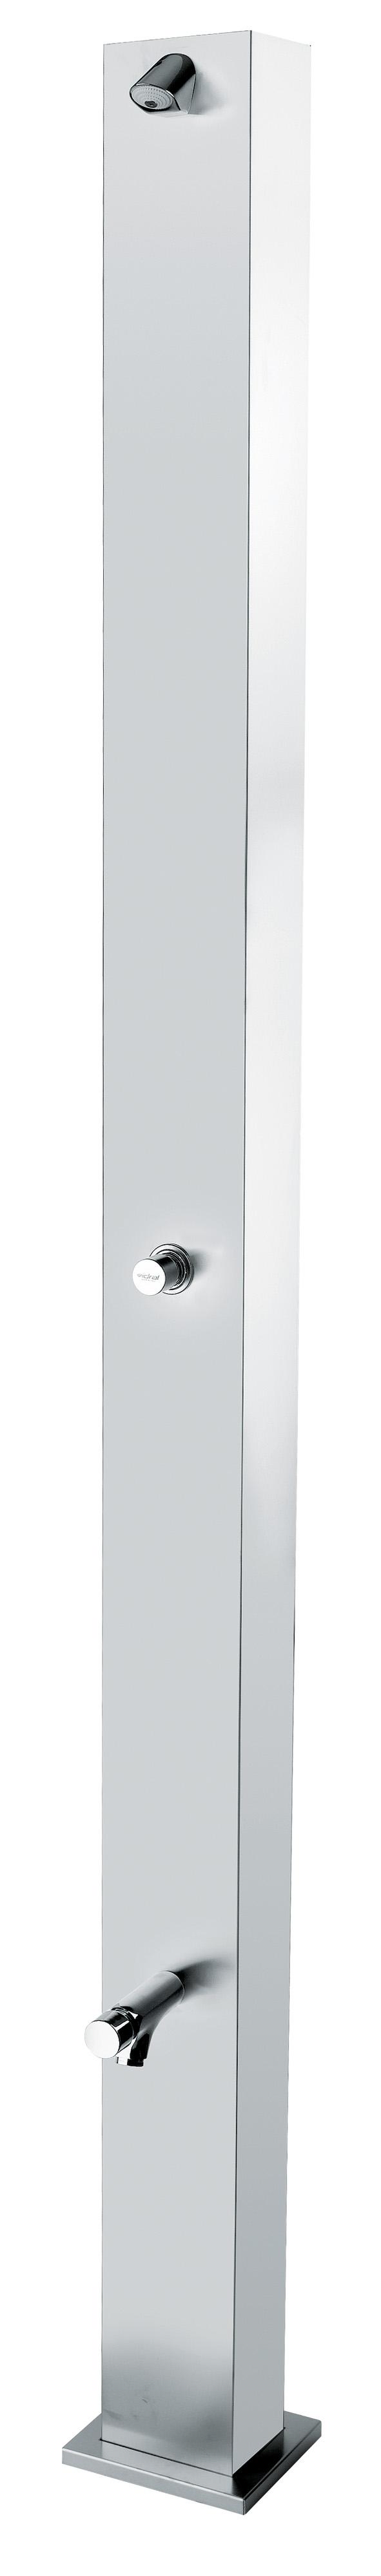 Sprchový stĺp IDRAL 09220/L SAPREM